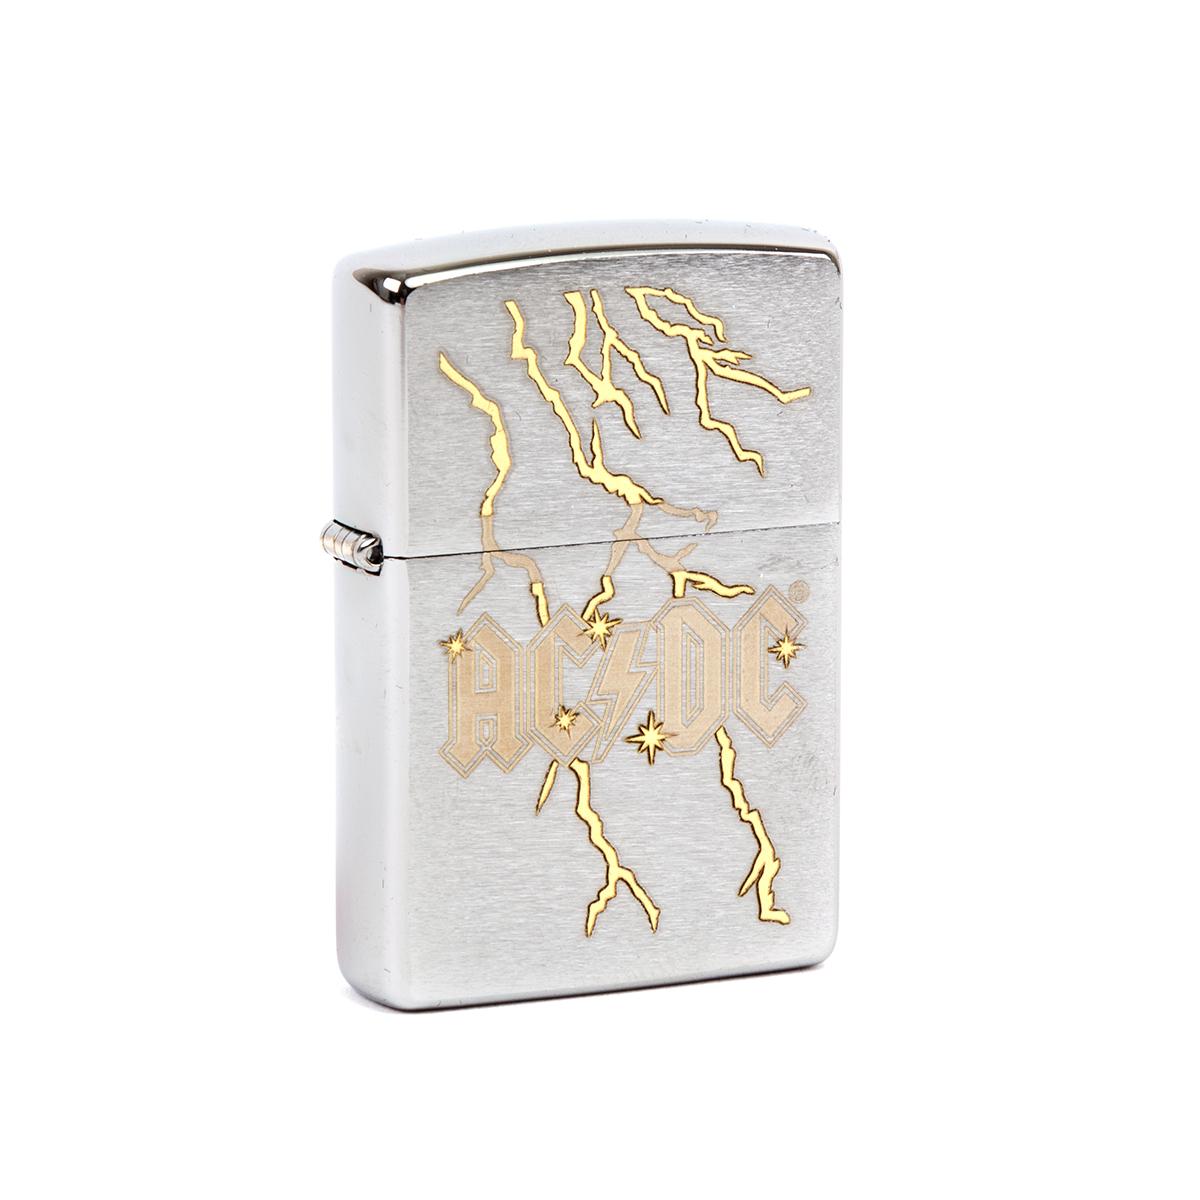 AC/DC Silver Lightning Bolt Zippo Lighter